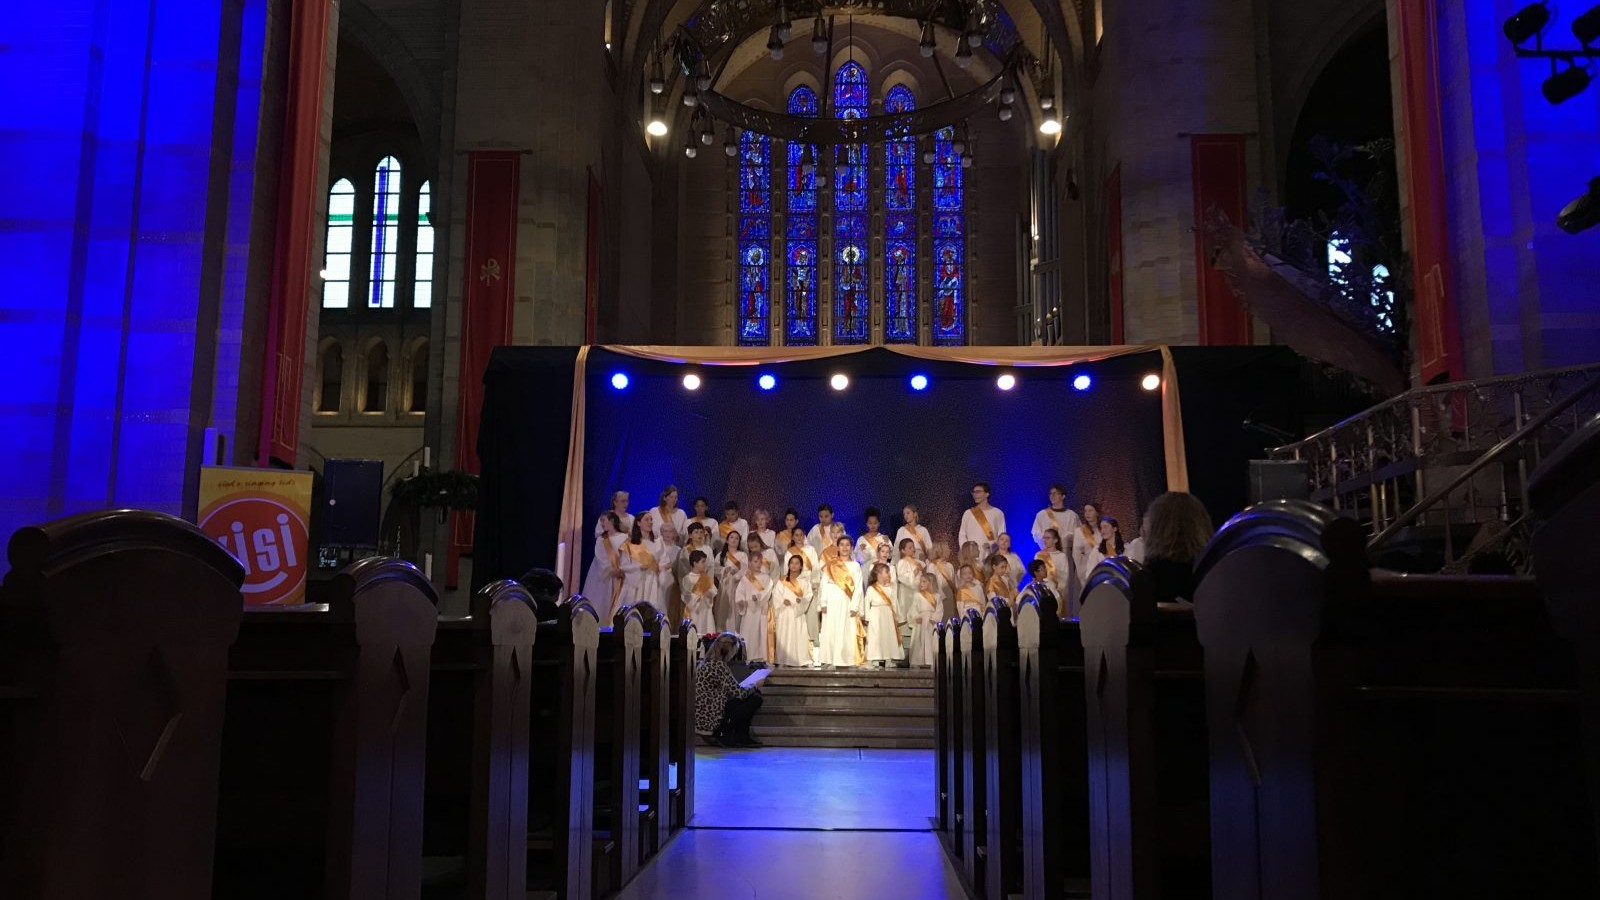 KISI Hemel op Stelten Bavo Kathedraal Haarlem kinderen